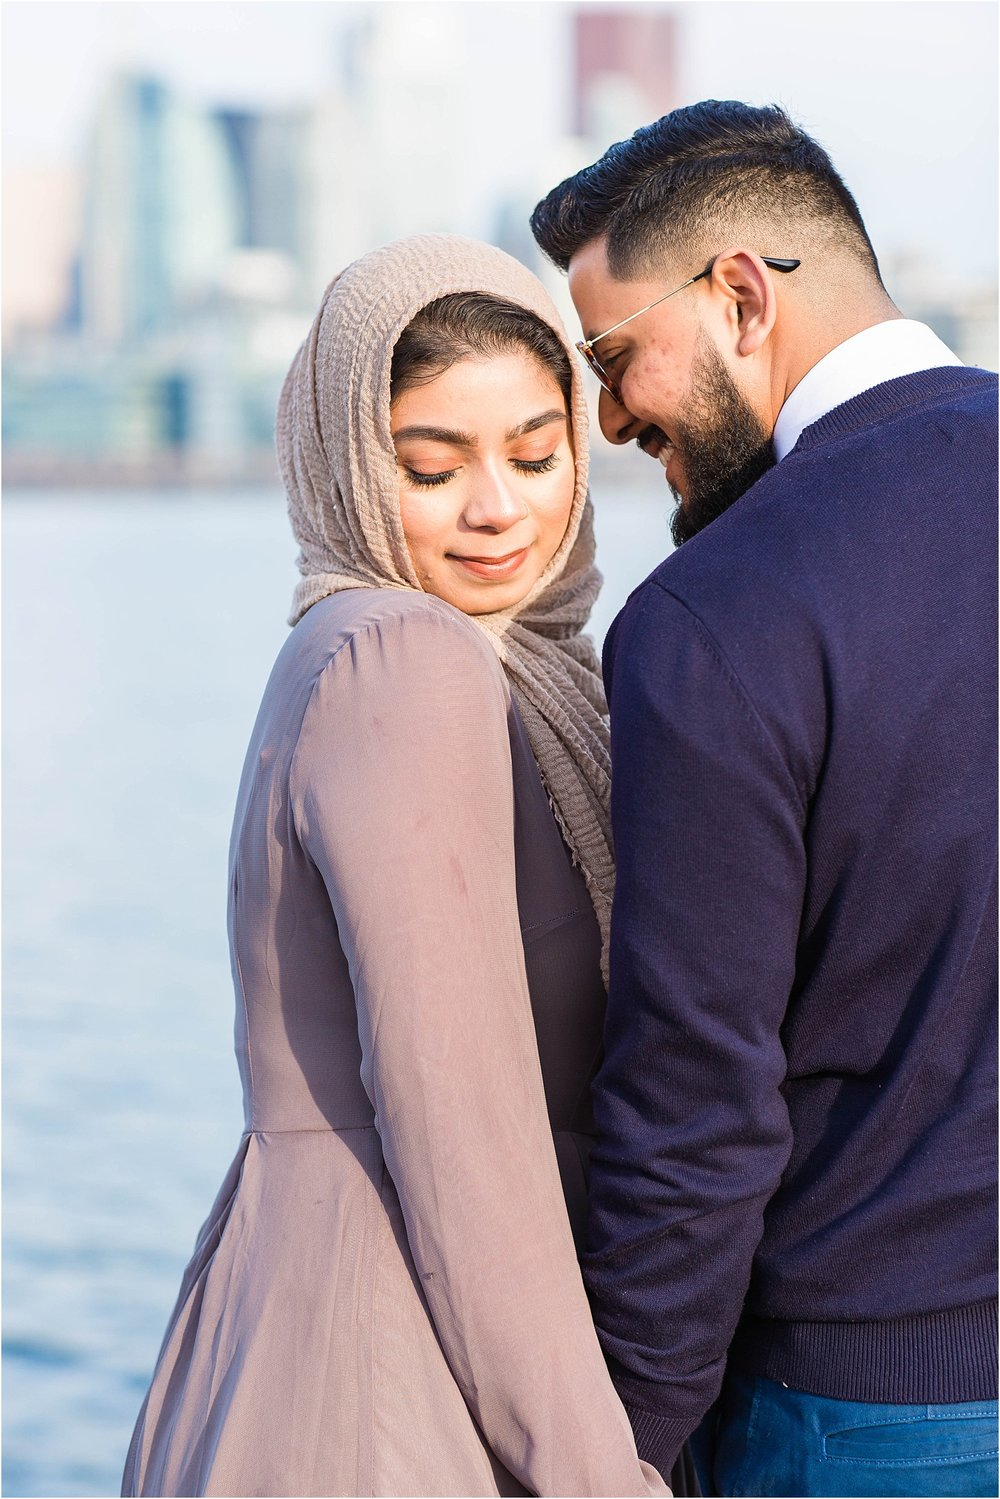 Polson-Pier-Distillery-District-Engagement-Session-Toronto-Mississauga-Brampton-Scarborough-GTA-Pakistani-Indian-Wedding-Engagement-Photographer-Photography_0014.jpg